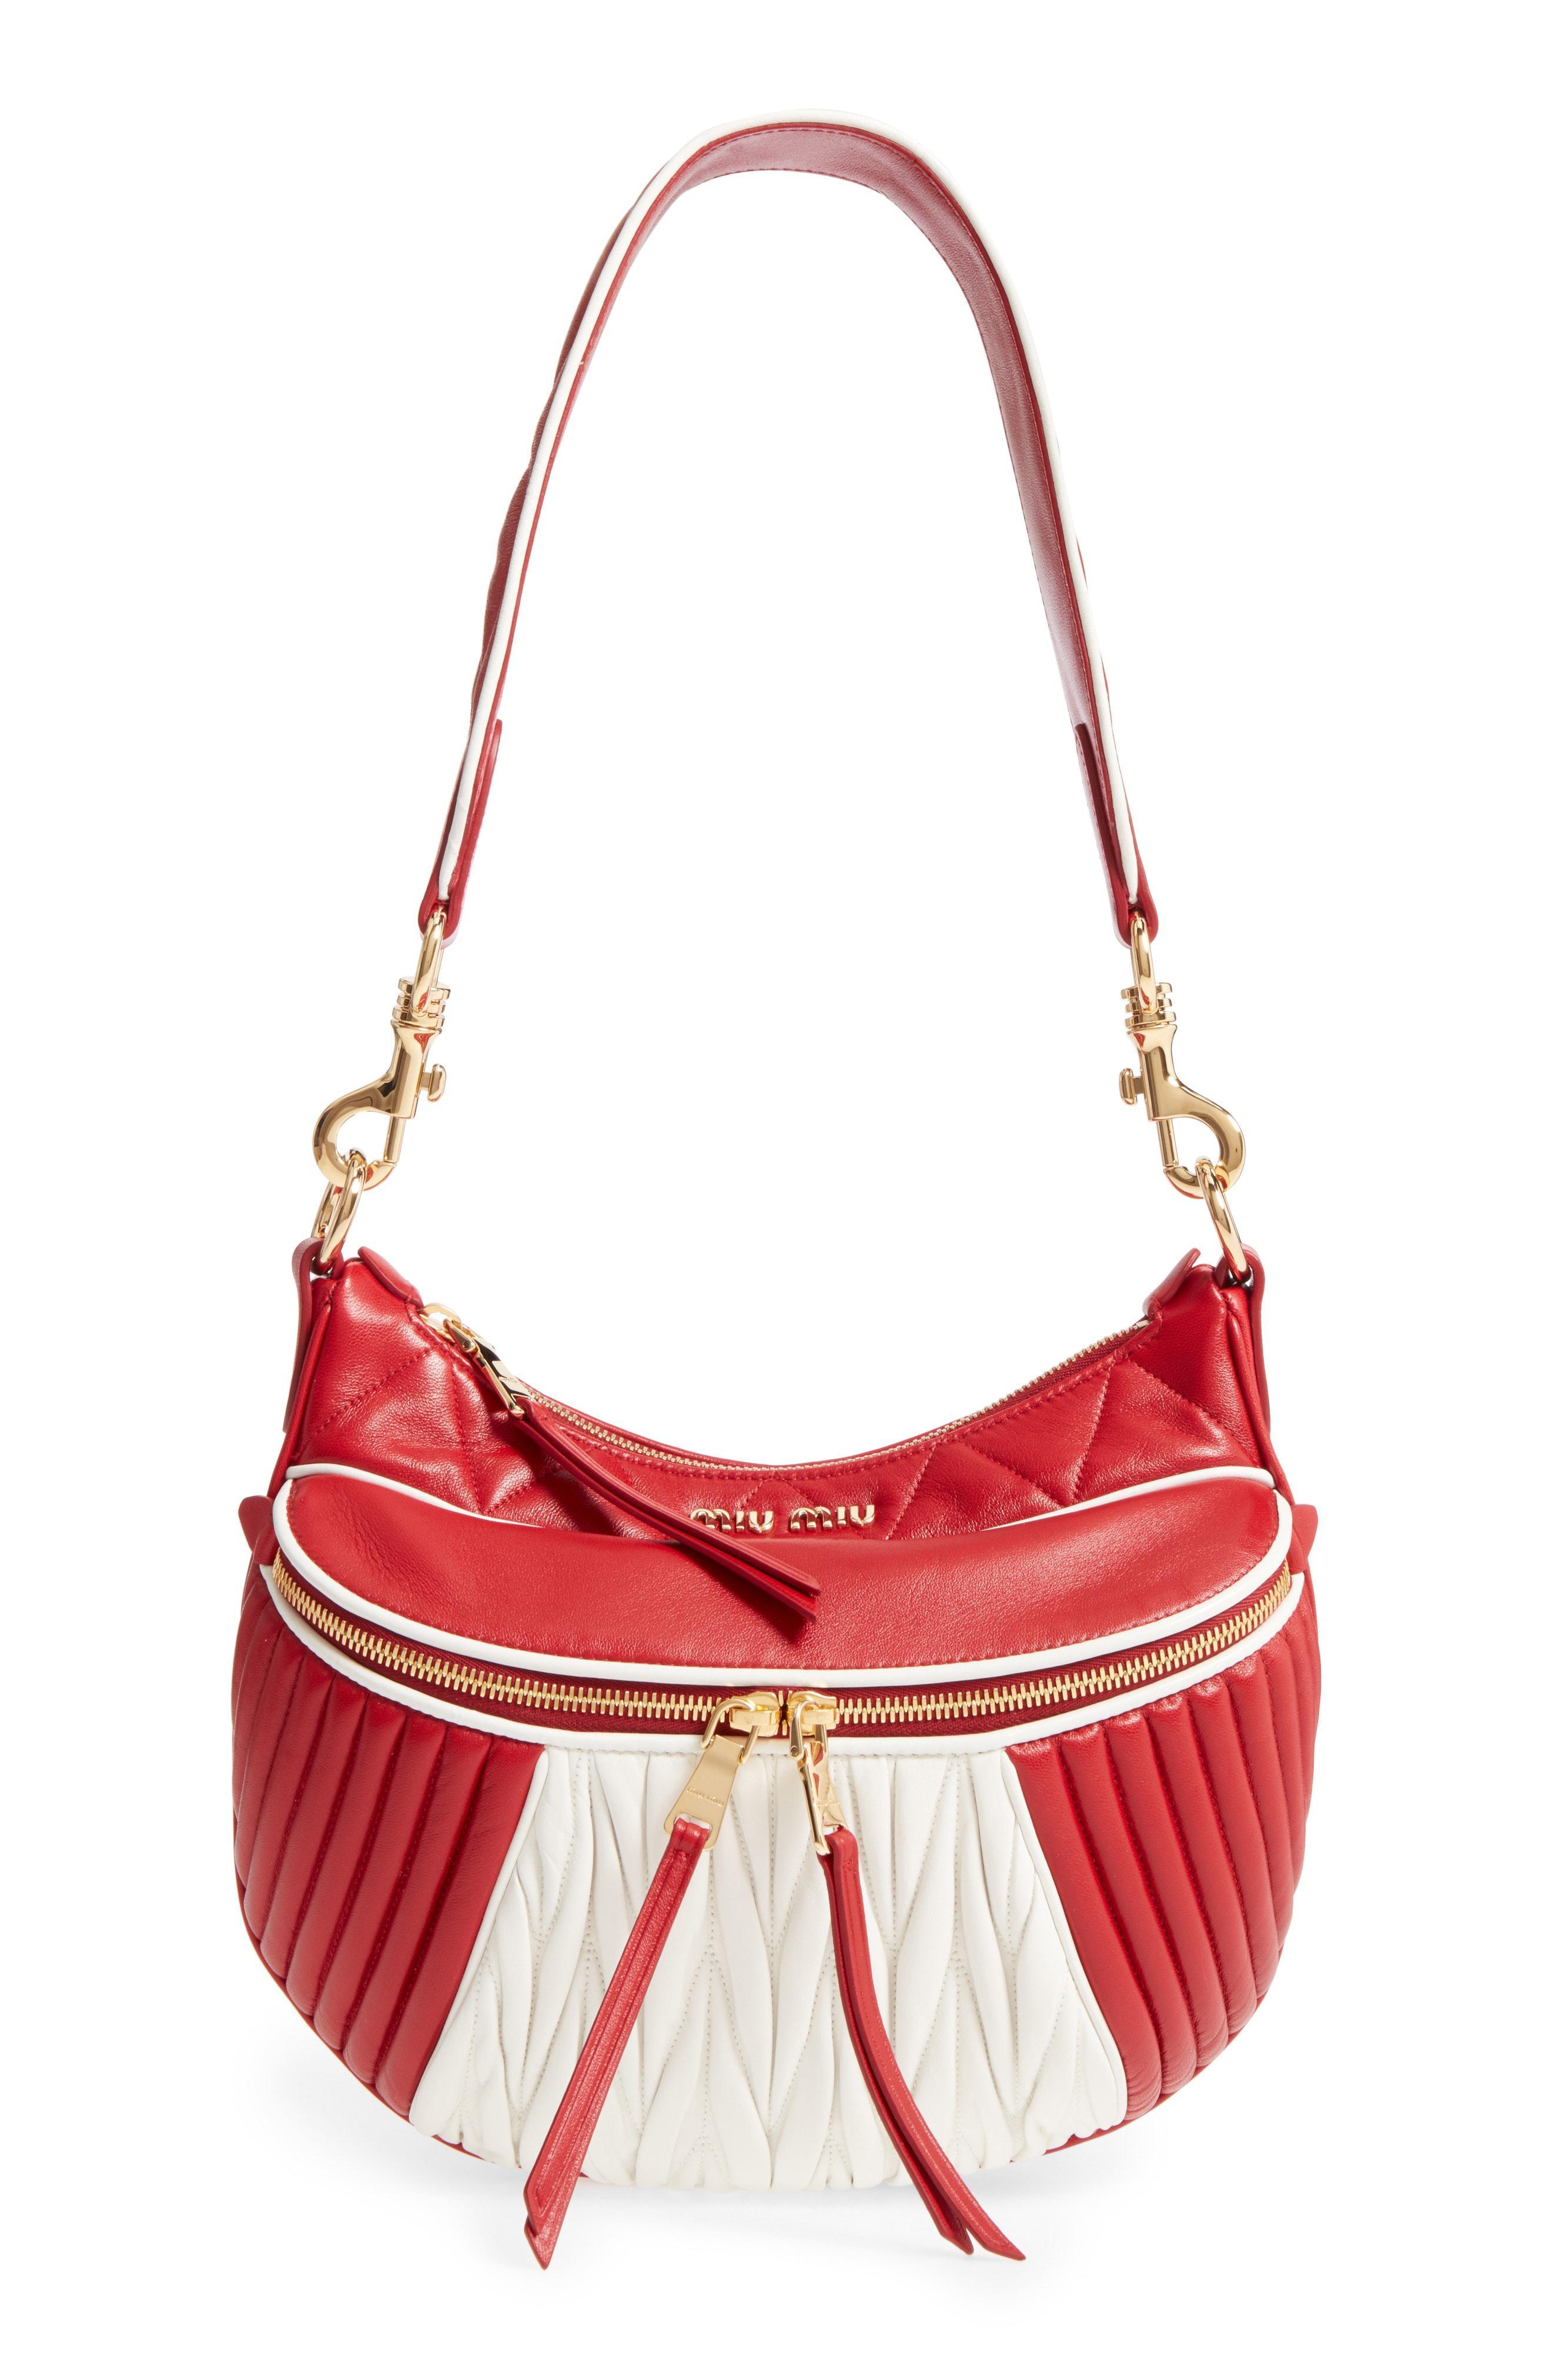 Miu Miu Small Rider Matelasse Leather Shoulder Bag - Red In Fuoco  Bianco f996e0b867189